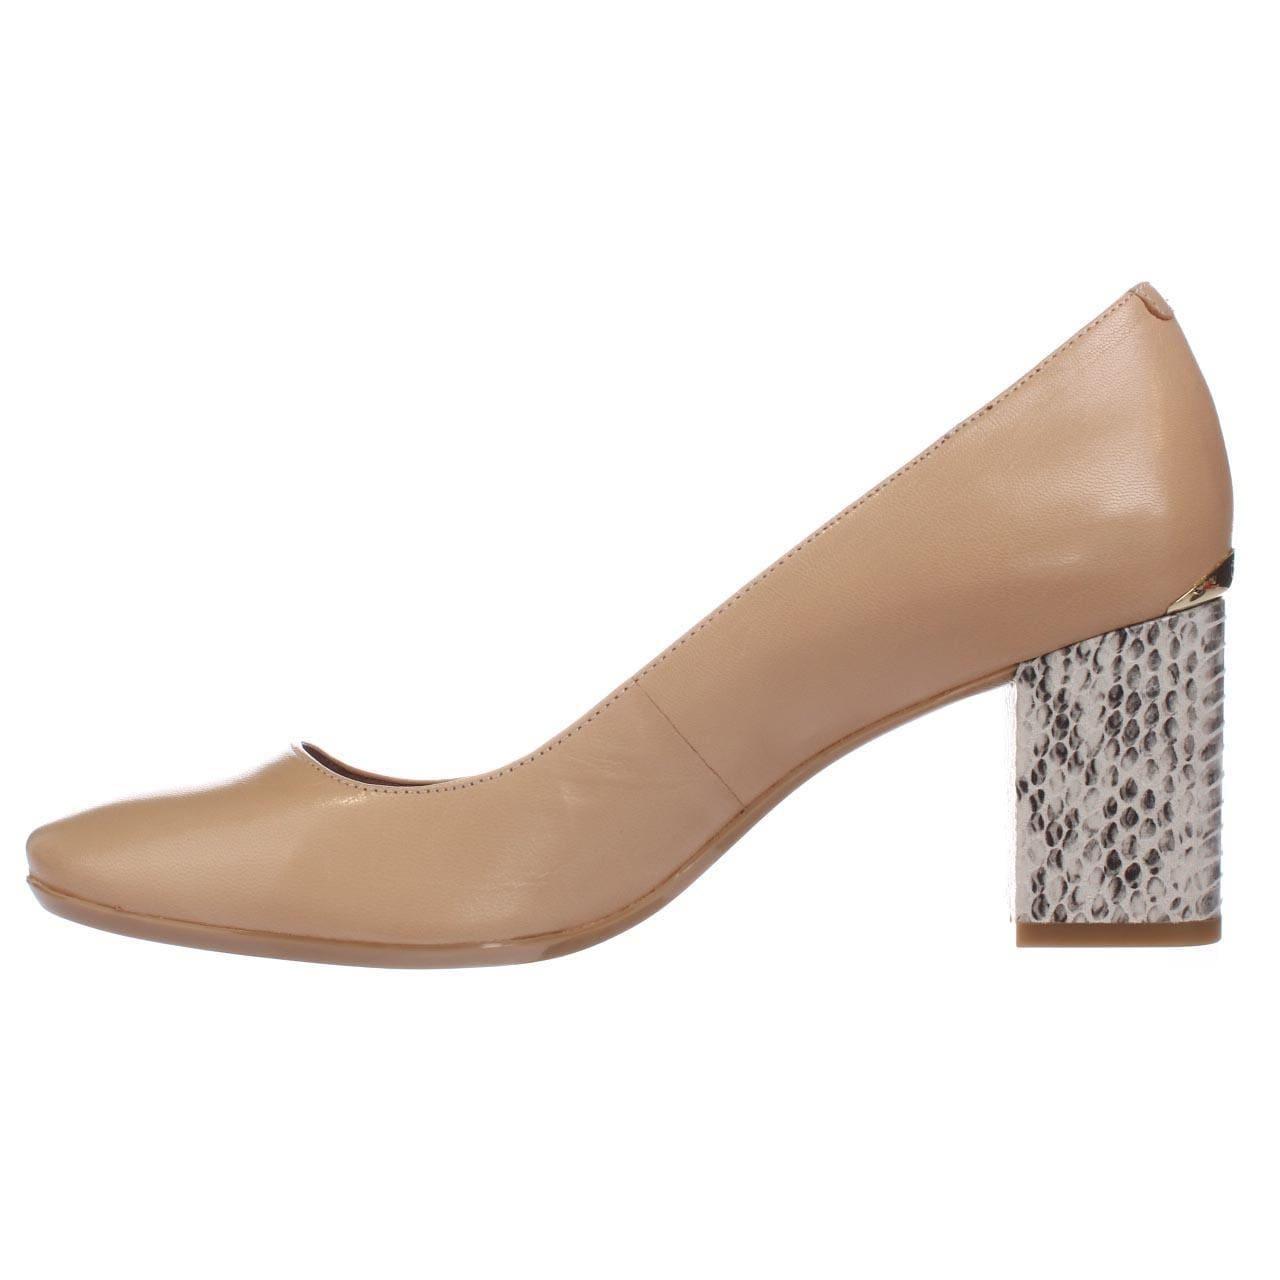 e244f87351 Shop Calvin Klein Cirilla Block Heel Pumps, Sandstorm - 9.5 us / 39.5 eu -  Free Shipping Today - Overstock - 21727628